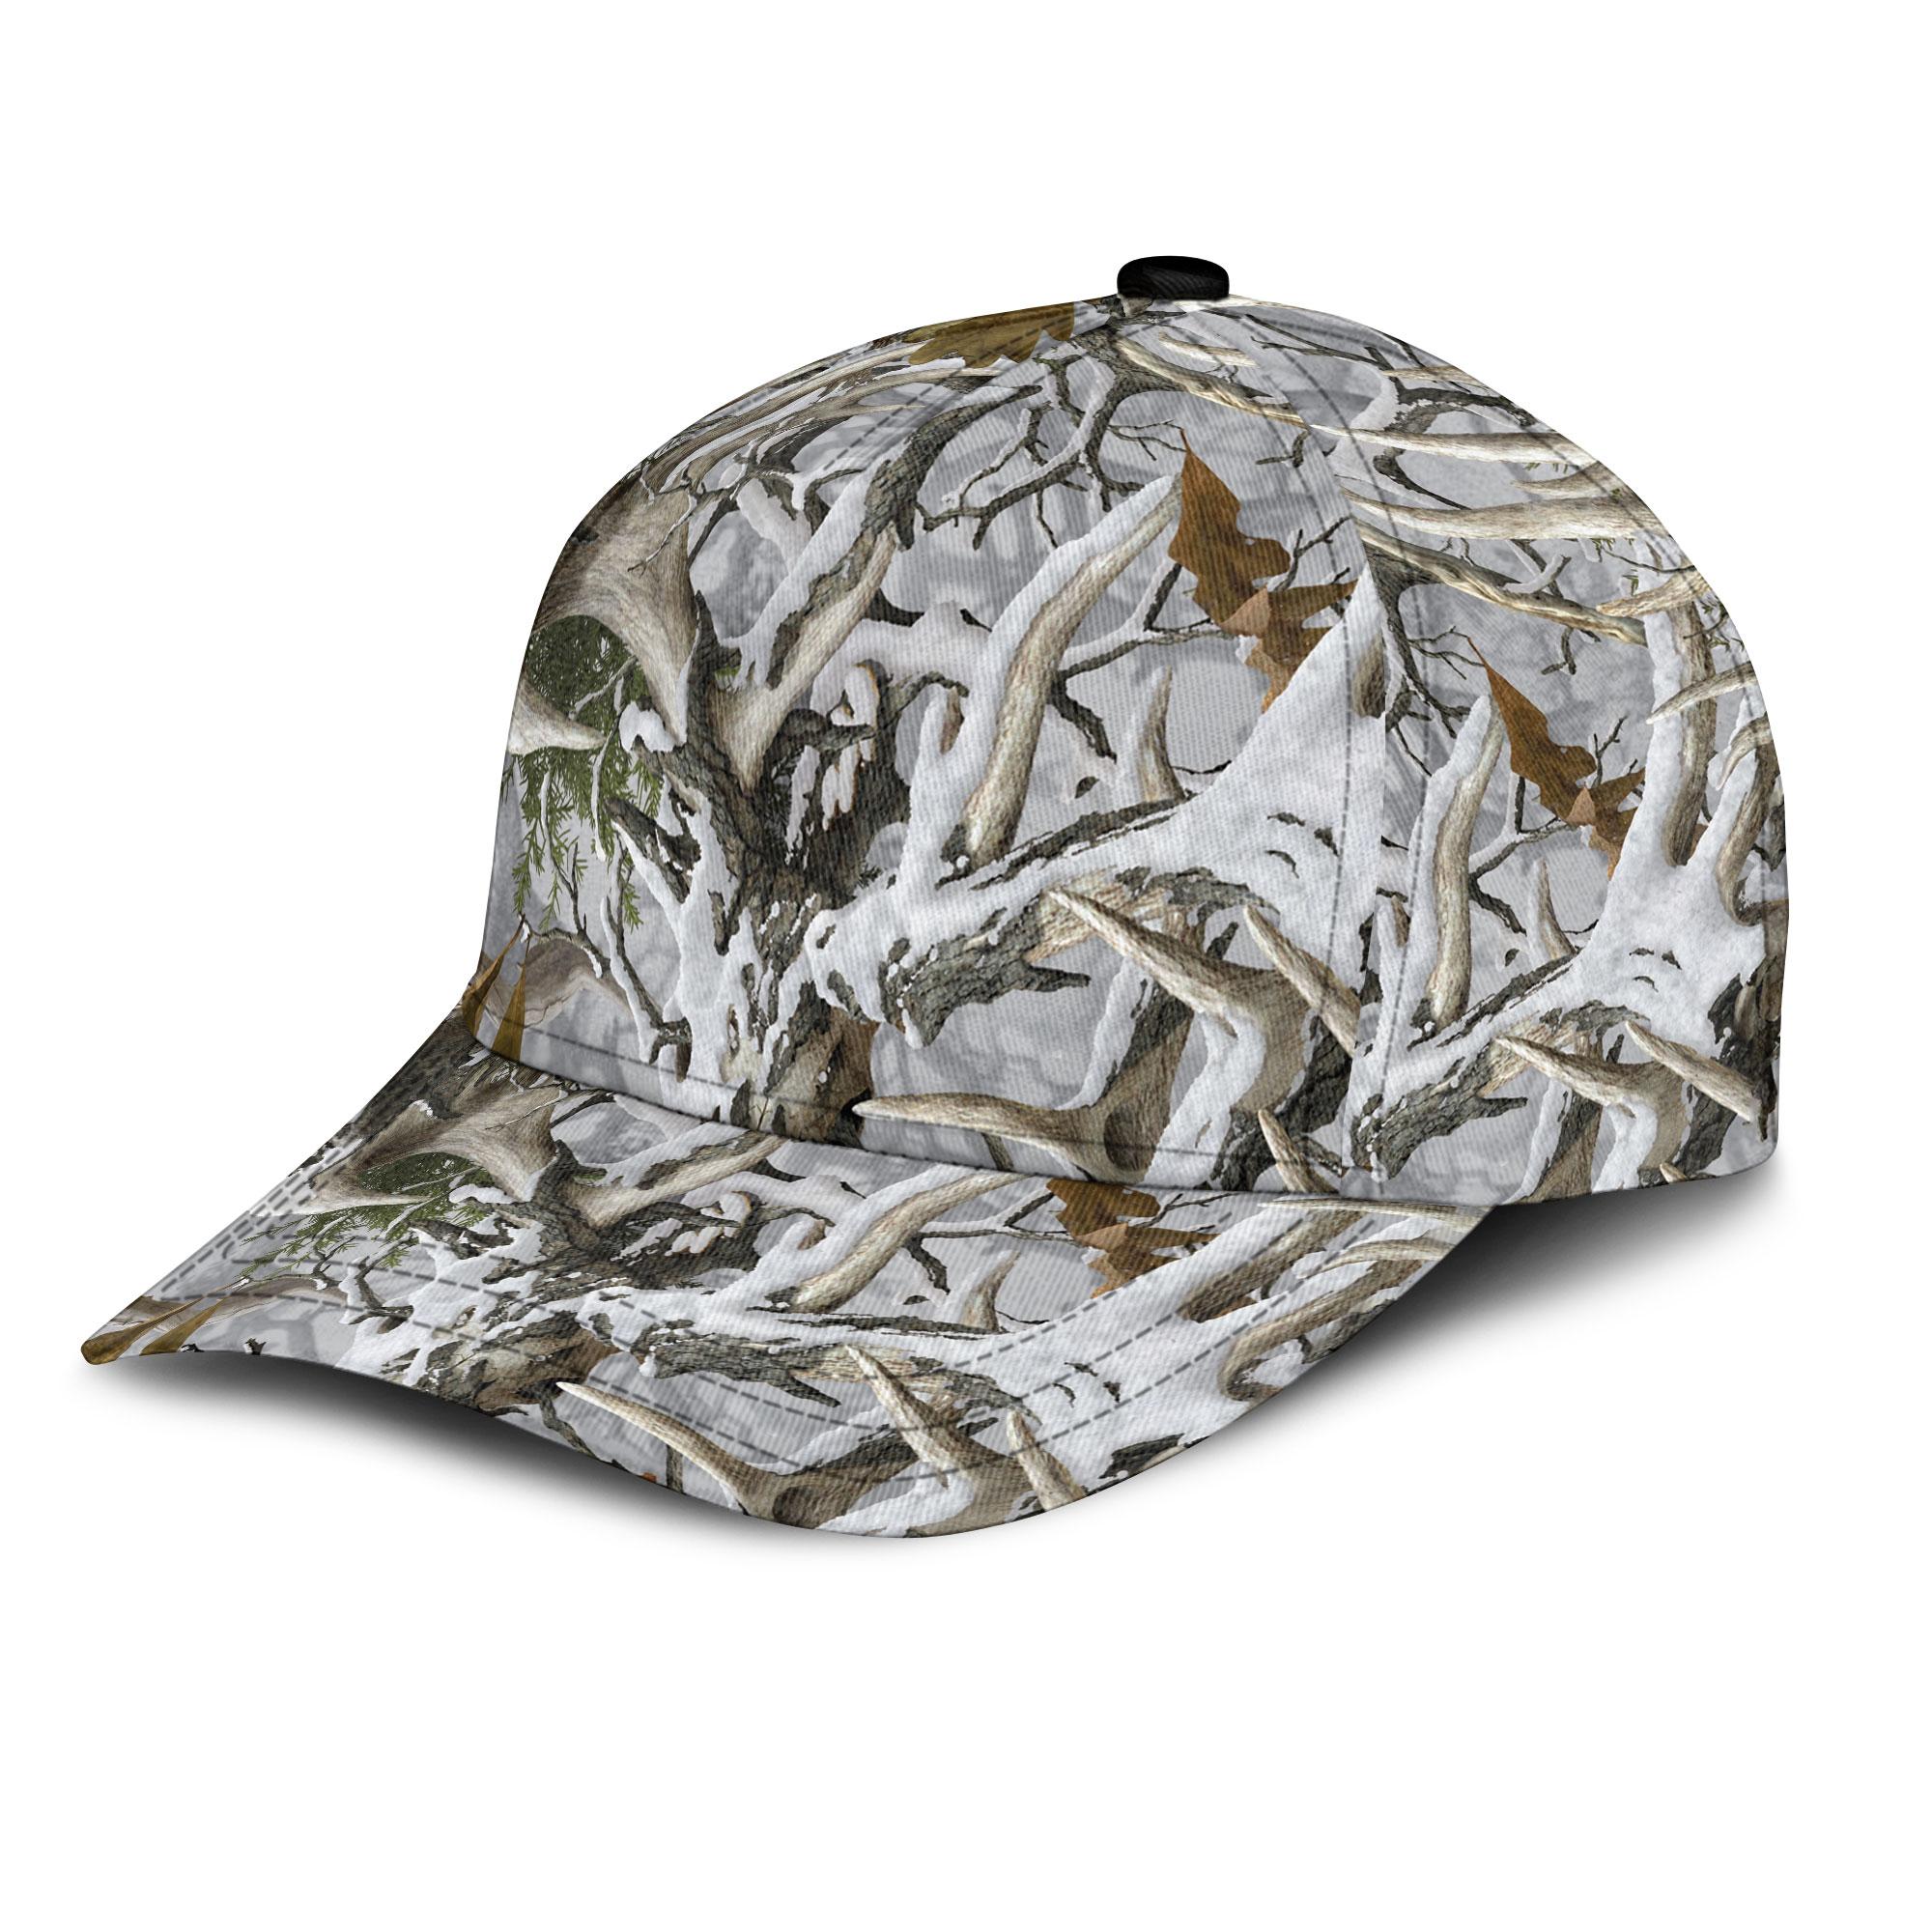 Love Hunting Camouflage Sku 120 Classic Cap